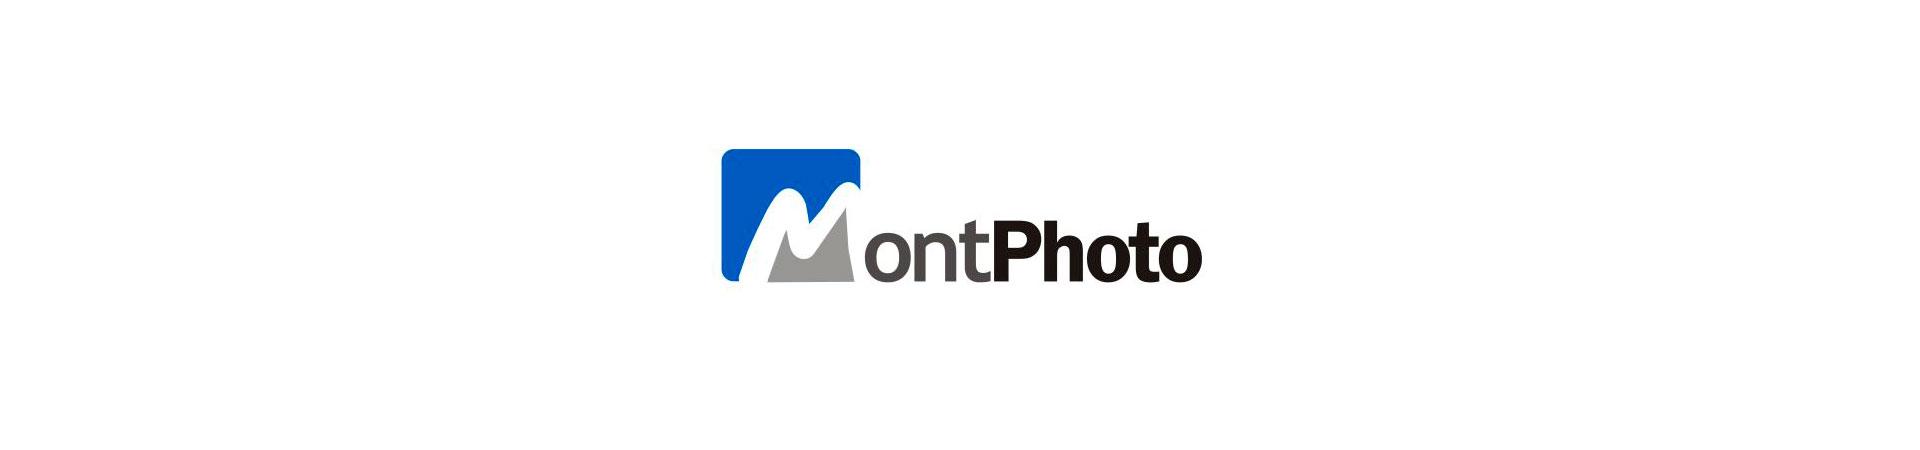 MontPhoto Fest 2019